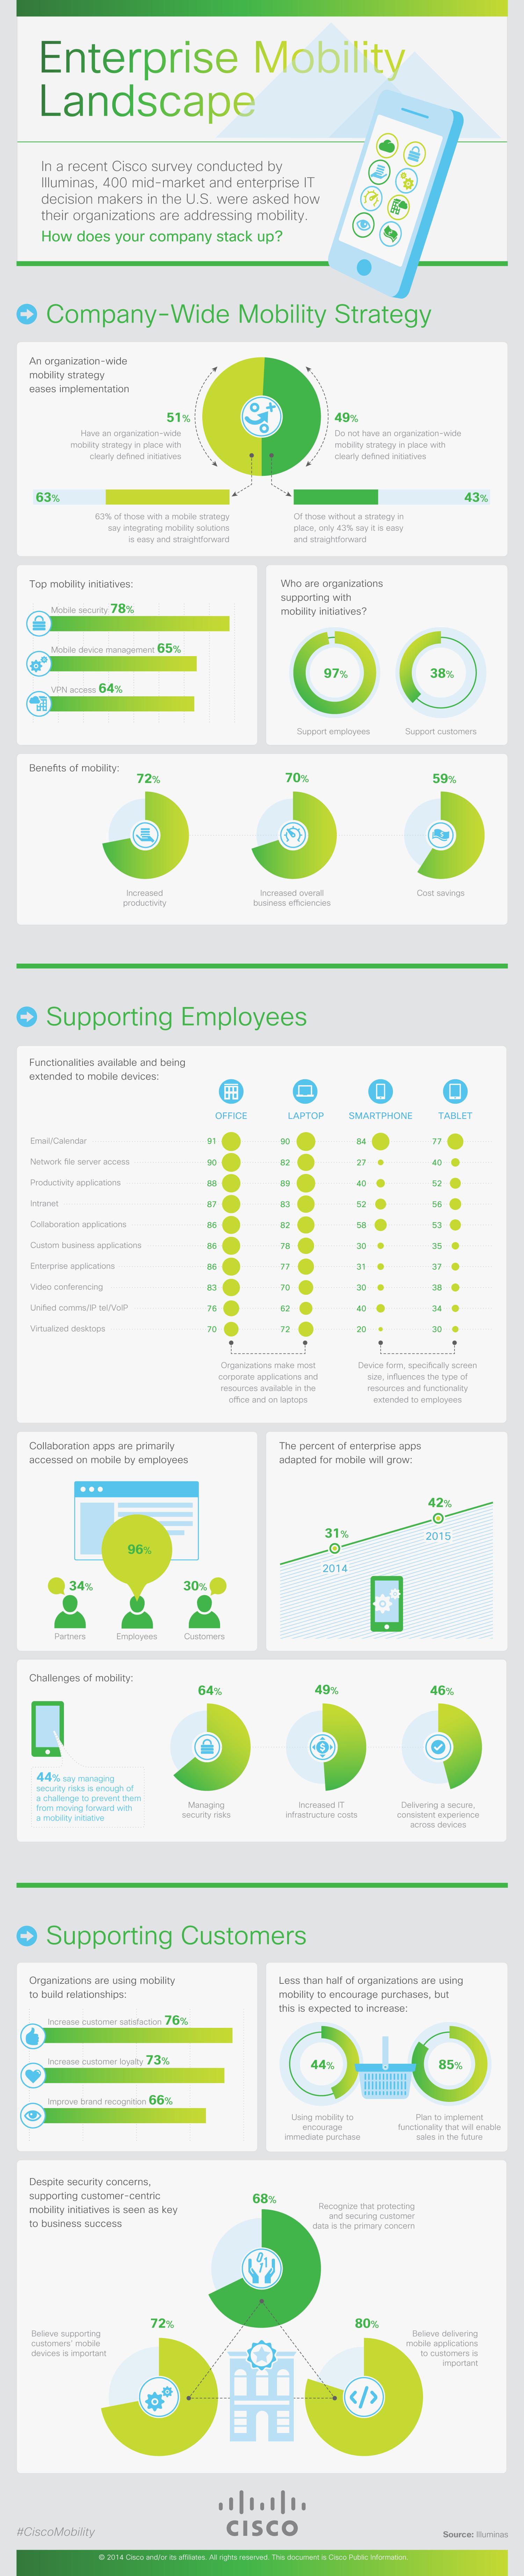 Enterprise Mobility Landscape | Cisco, Illuminas | Makemark